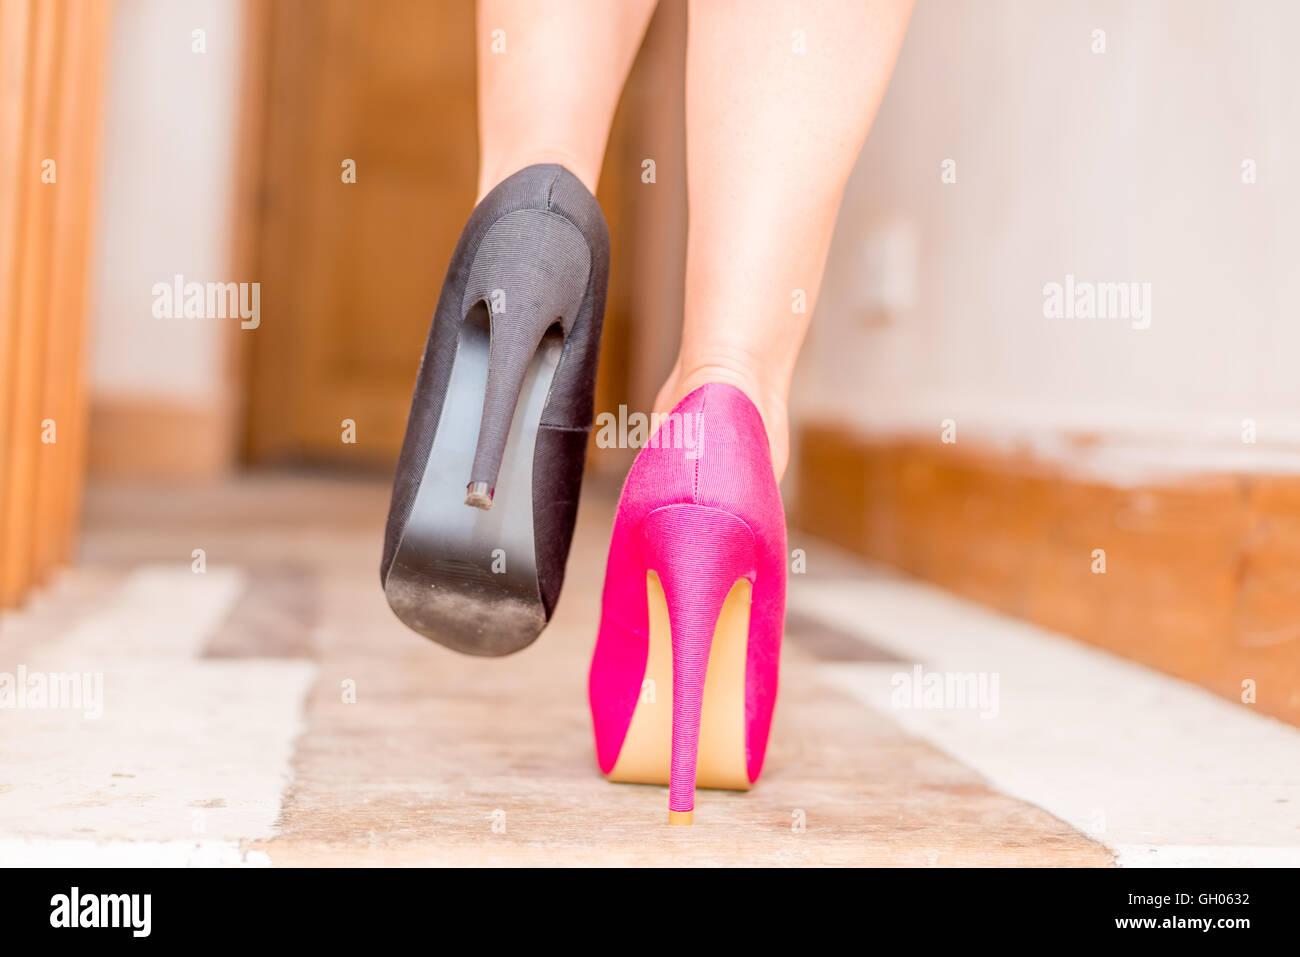 1c9b2ea7b279b Femme portant des chaussures bizarres Photo Stock